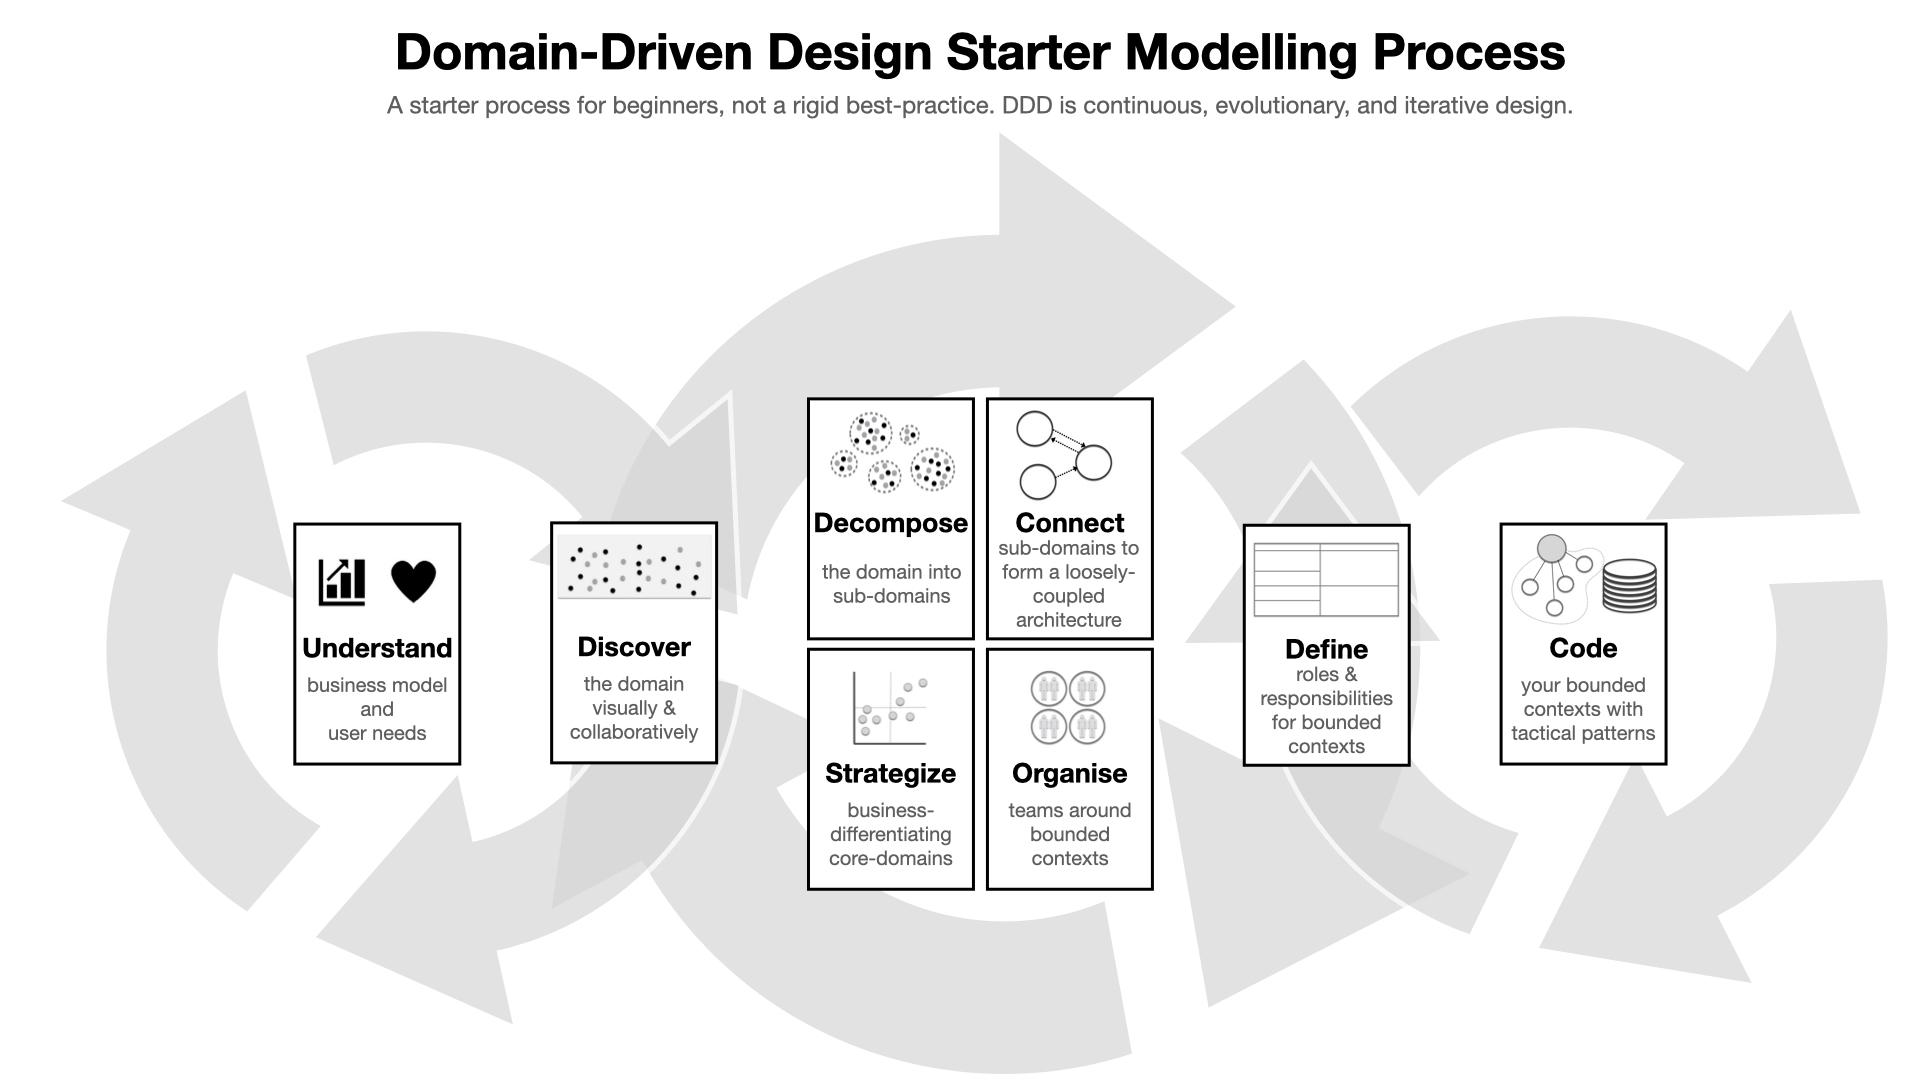 DDD Starter Modelling Process